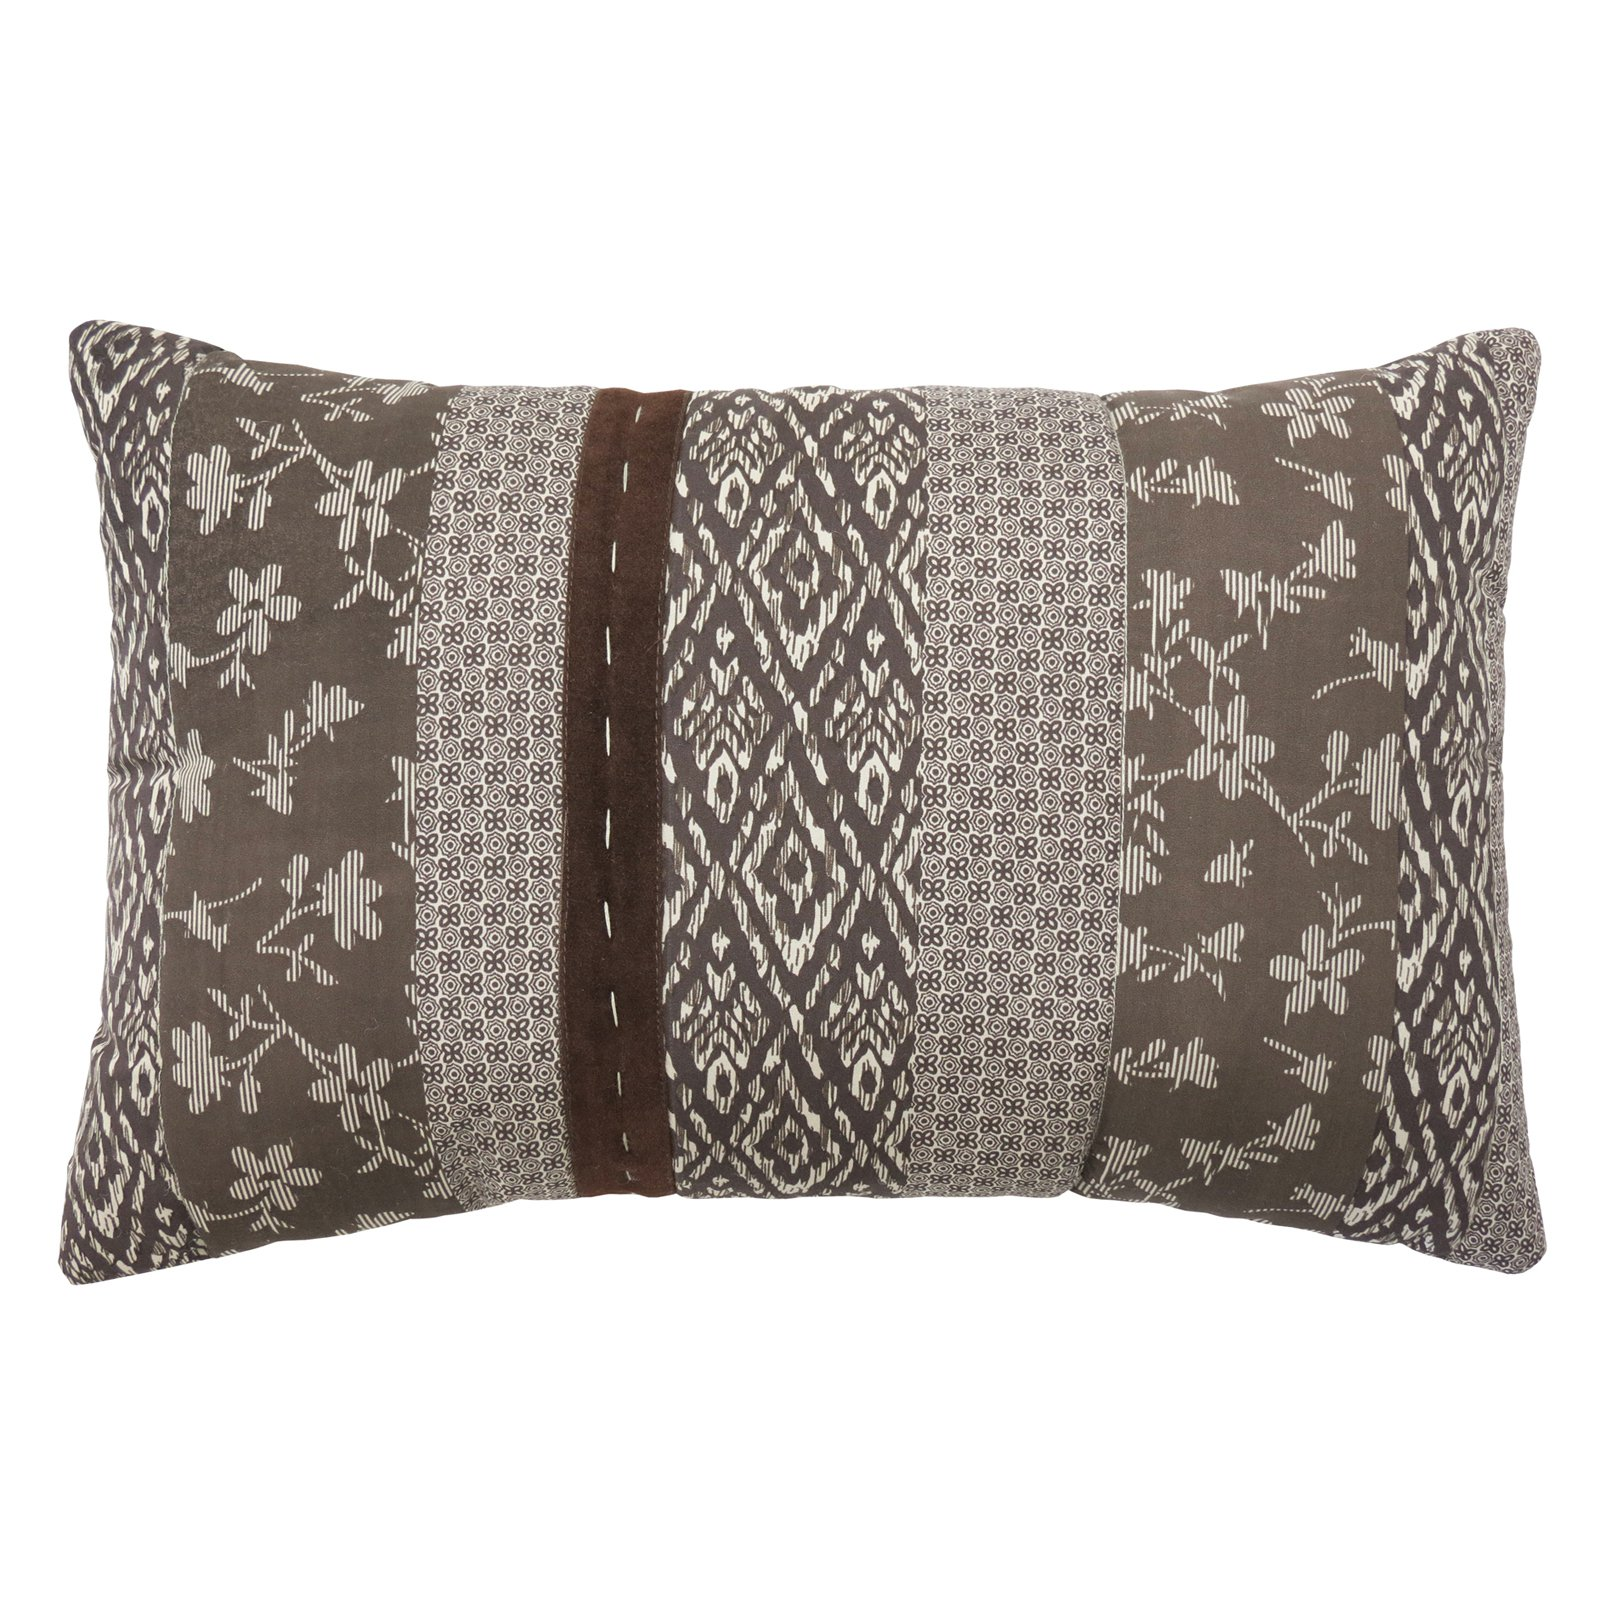 Vintage House by Park B. Smith Sundance Decorative Pillow